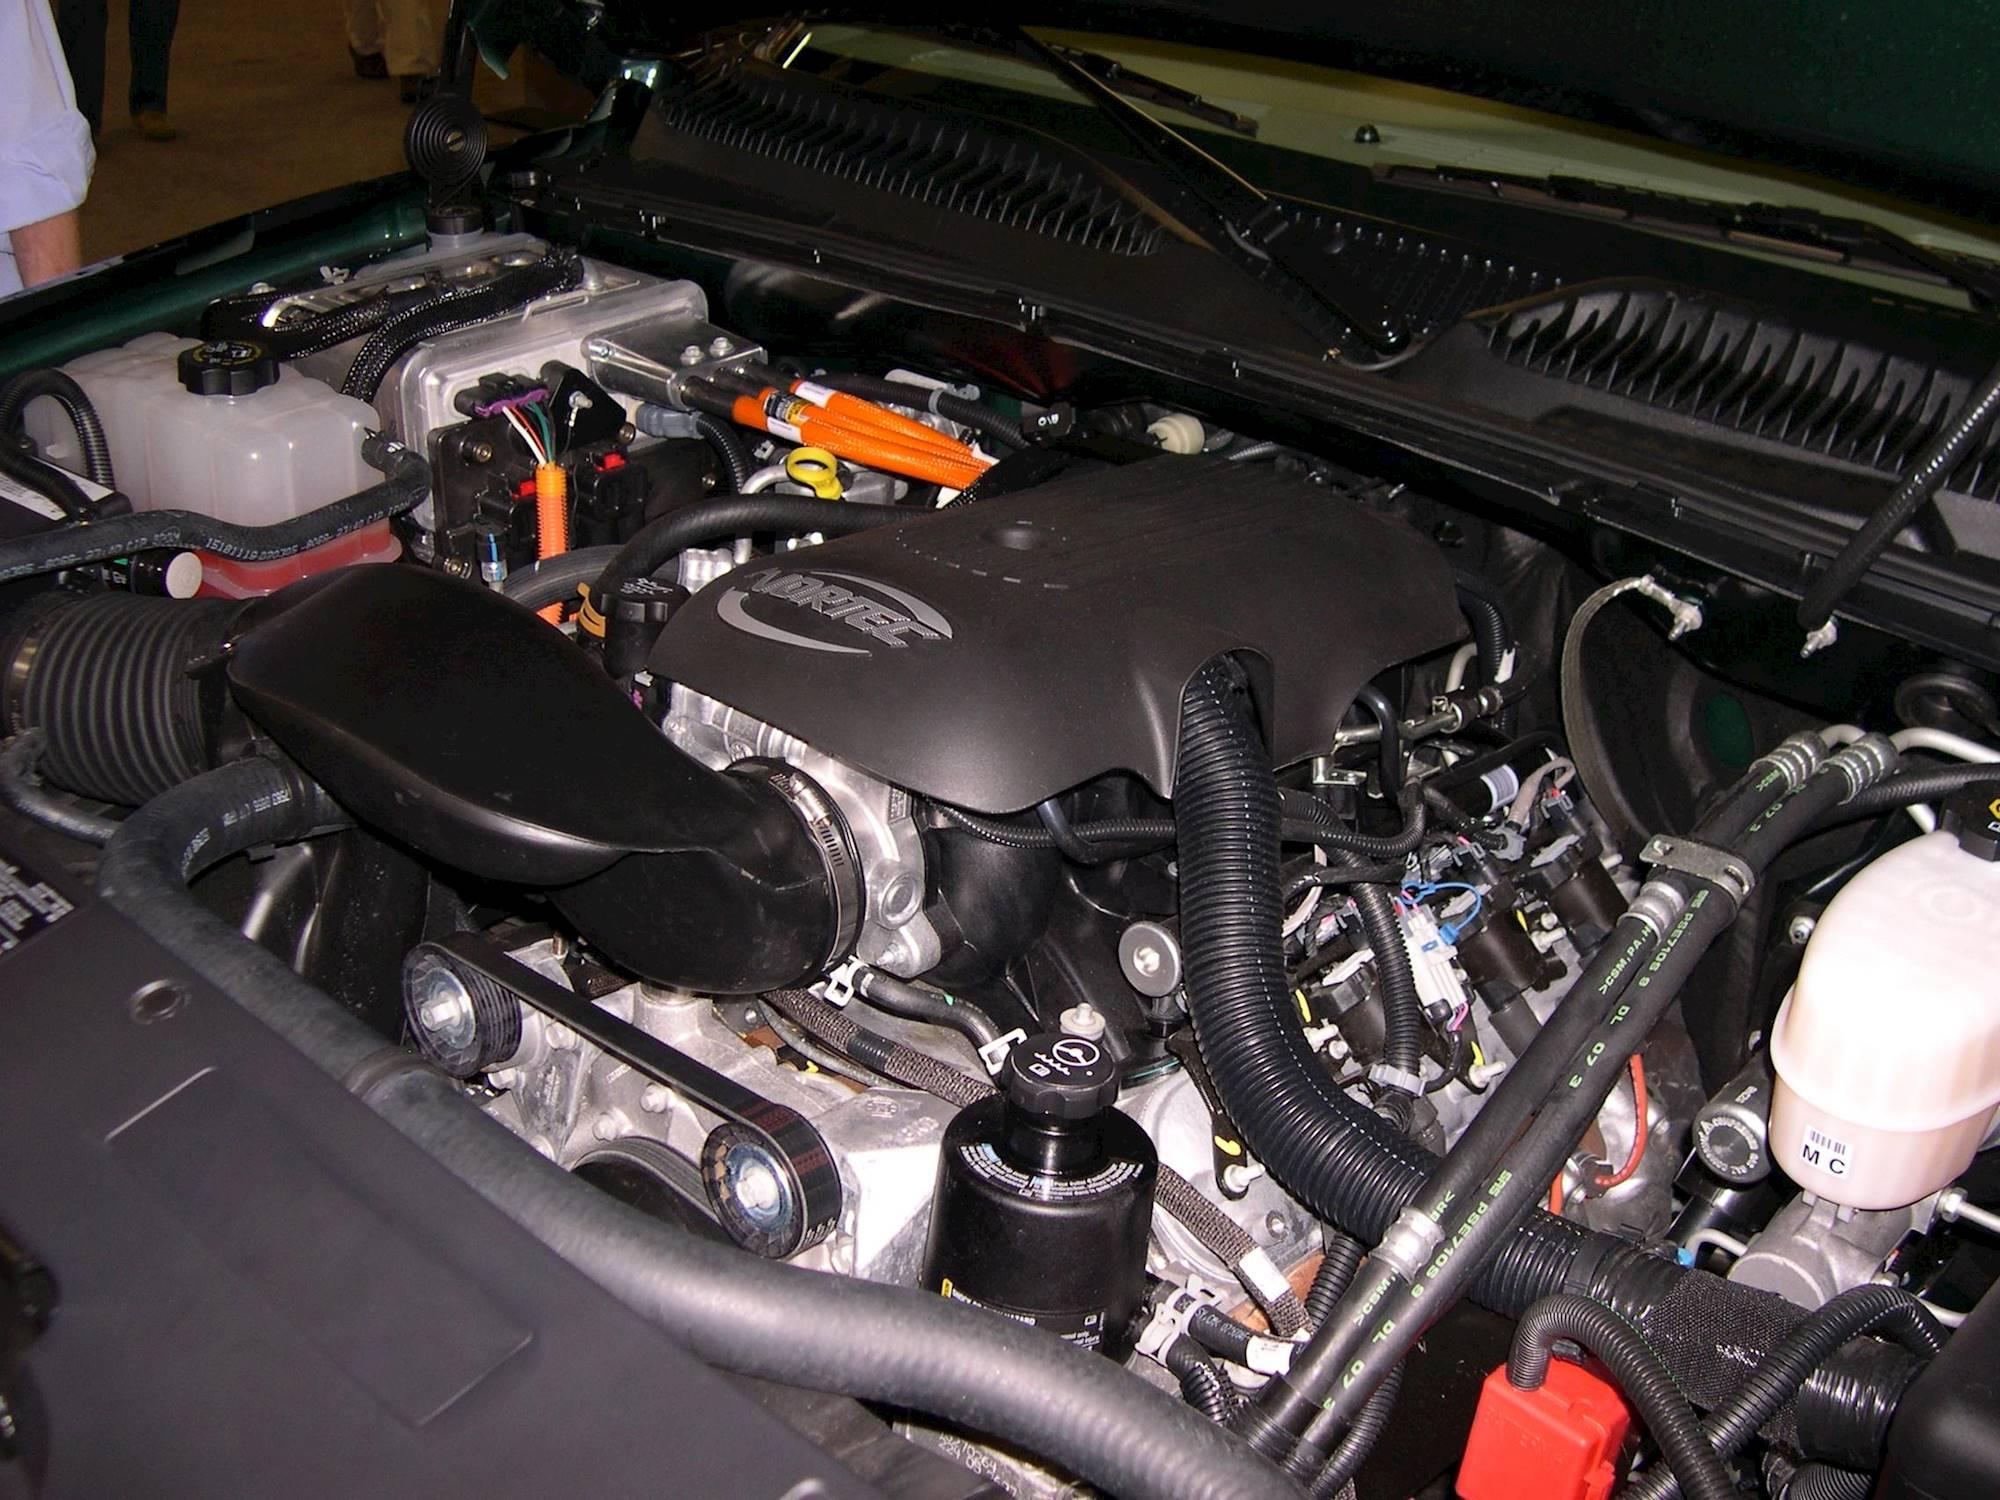 NS_7971] 2004 Gmc Truck Engine Diagram Wiring DiagramBotse Terch Elae Hroni Xeira Mohammedshrine Librar Wiring 101